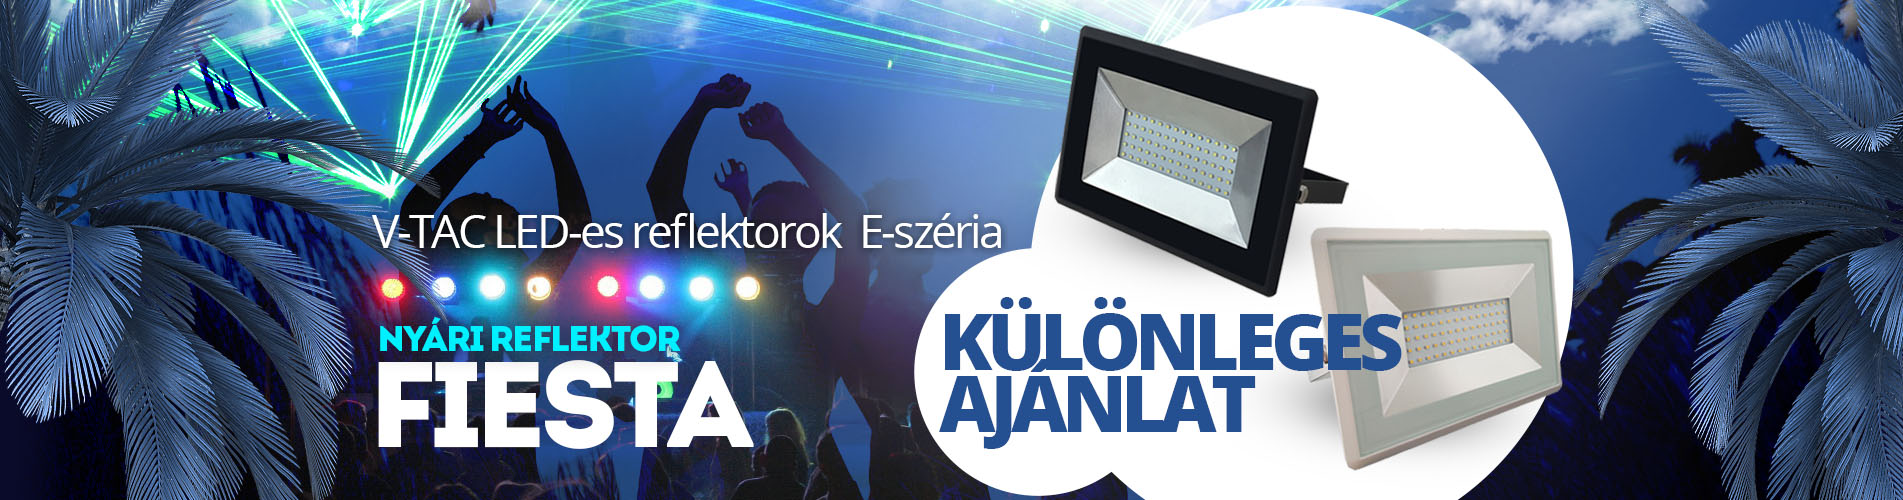 Akciós E-Series LED reflektorok